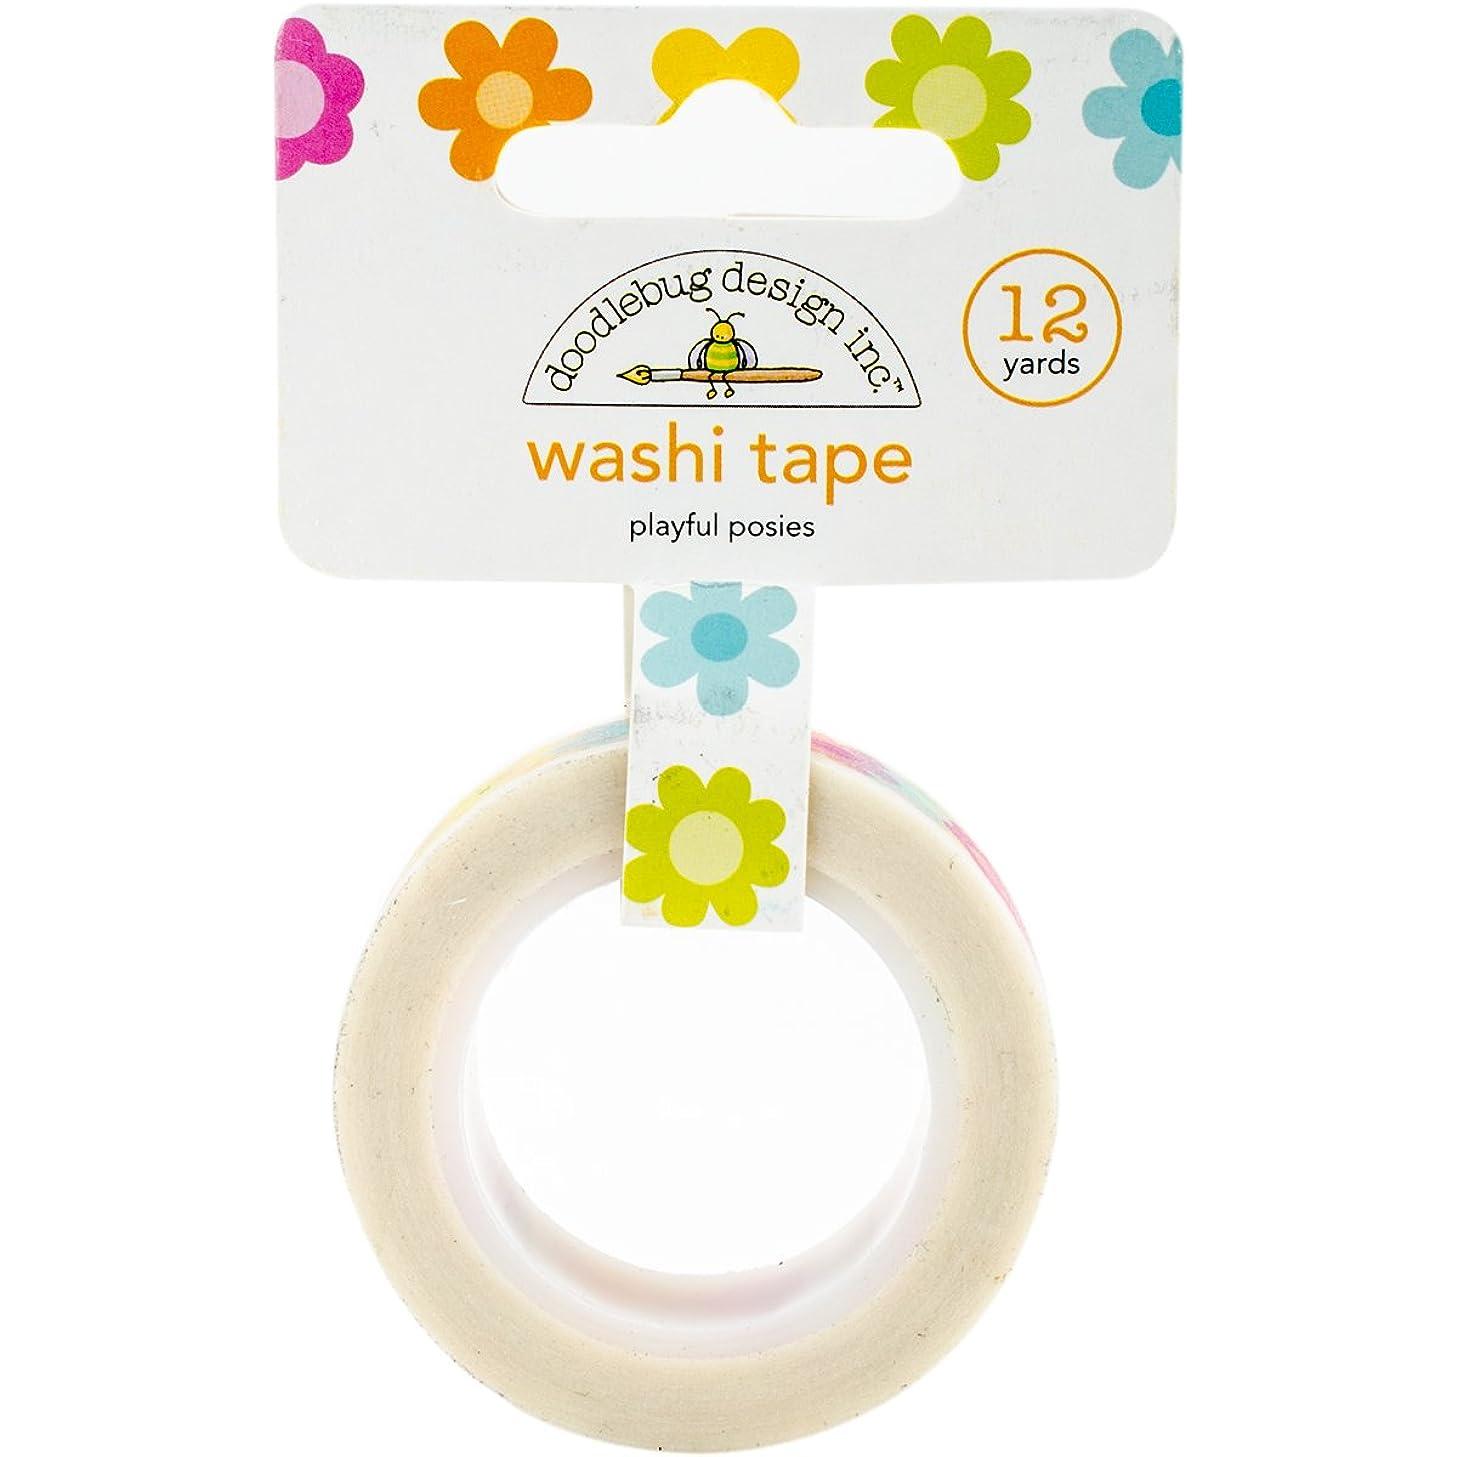 DOODLEBUG 4989 Washi Tape, 15mm x 12yd